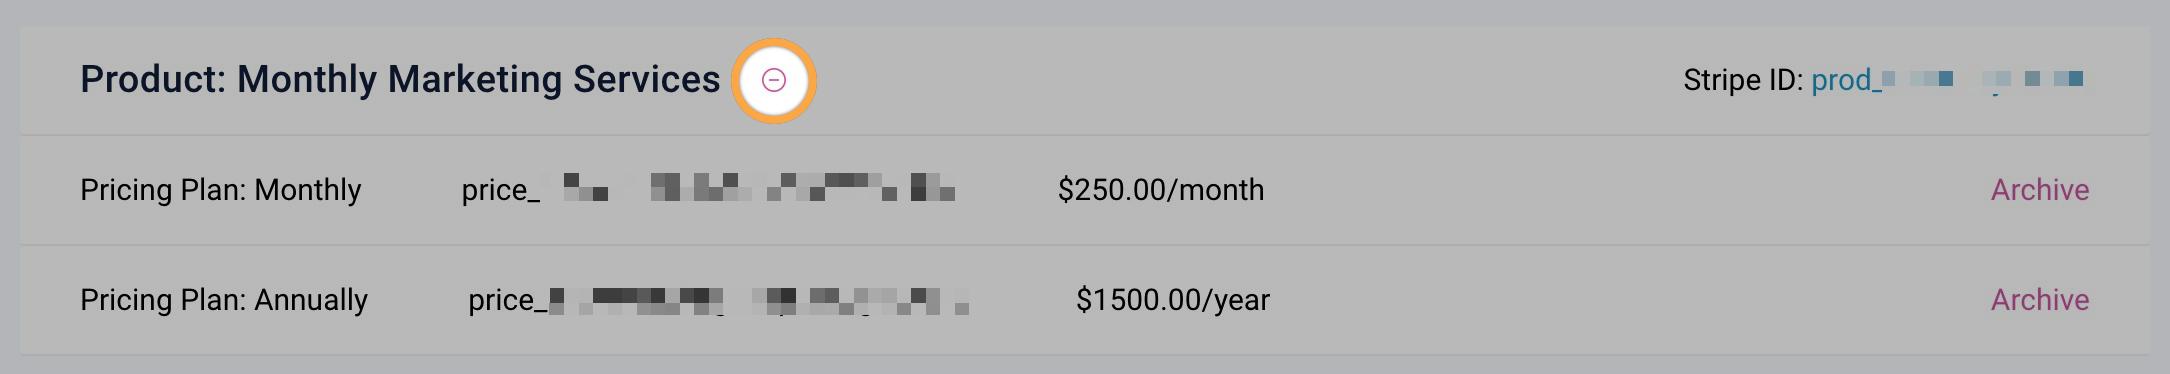 Chris Cardones payments 2021-01-04 at 6.58.08 PM-1